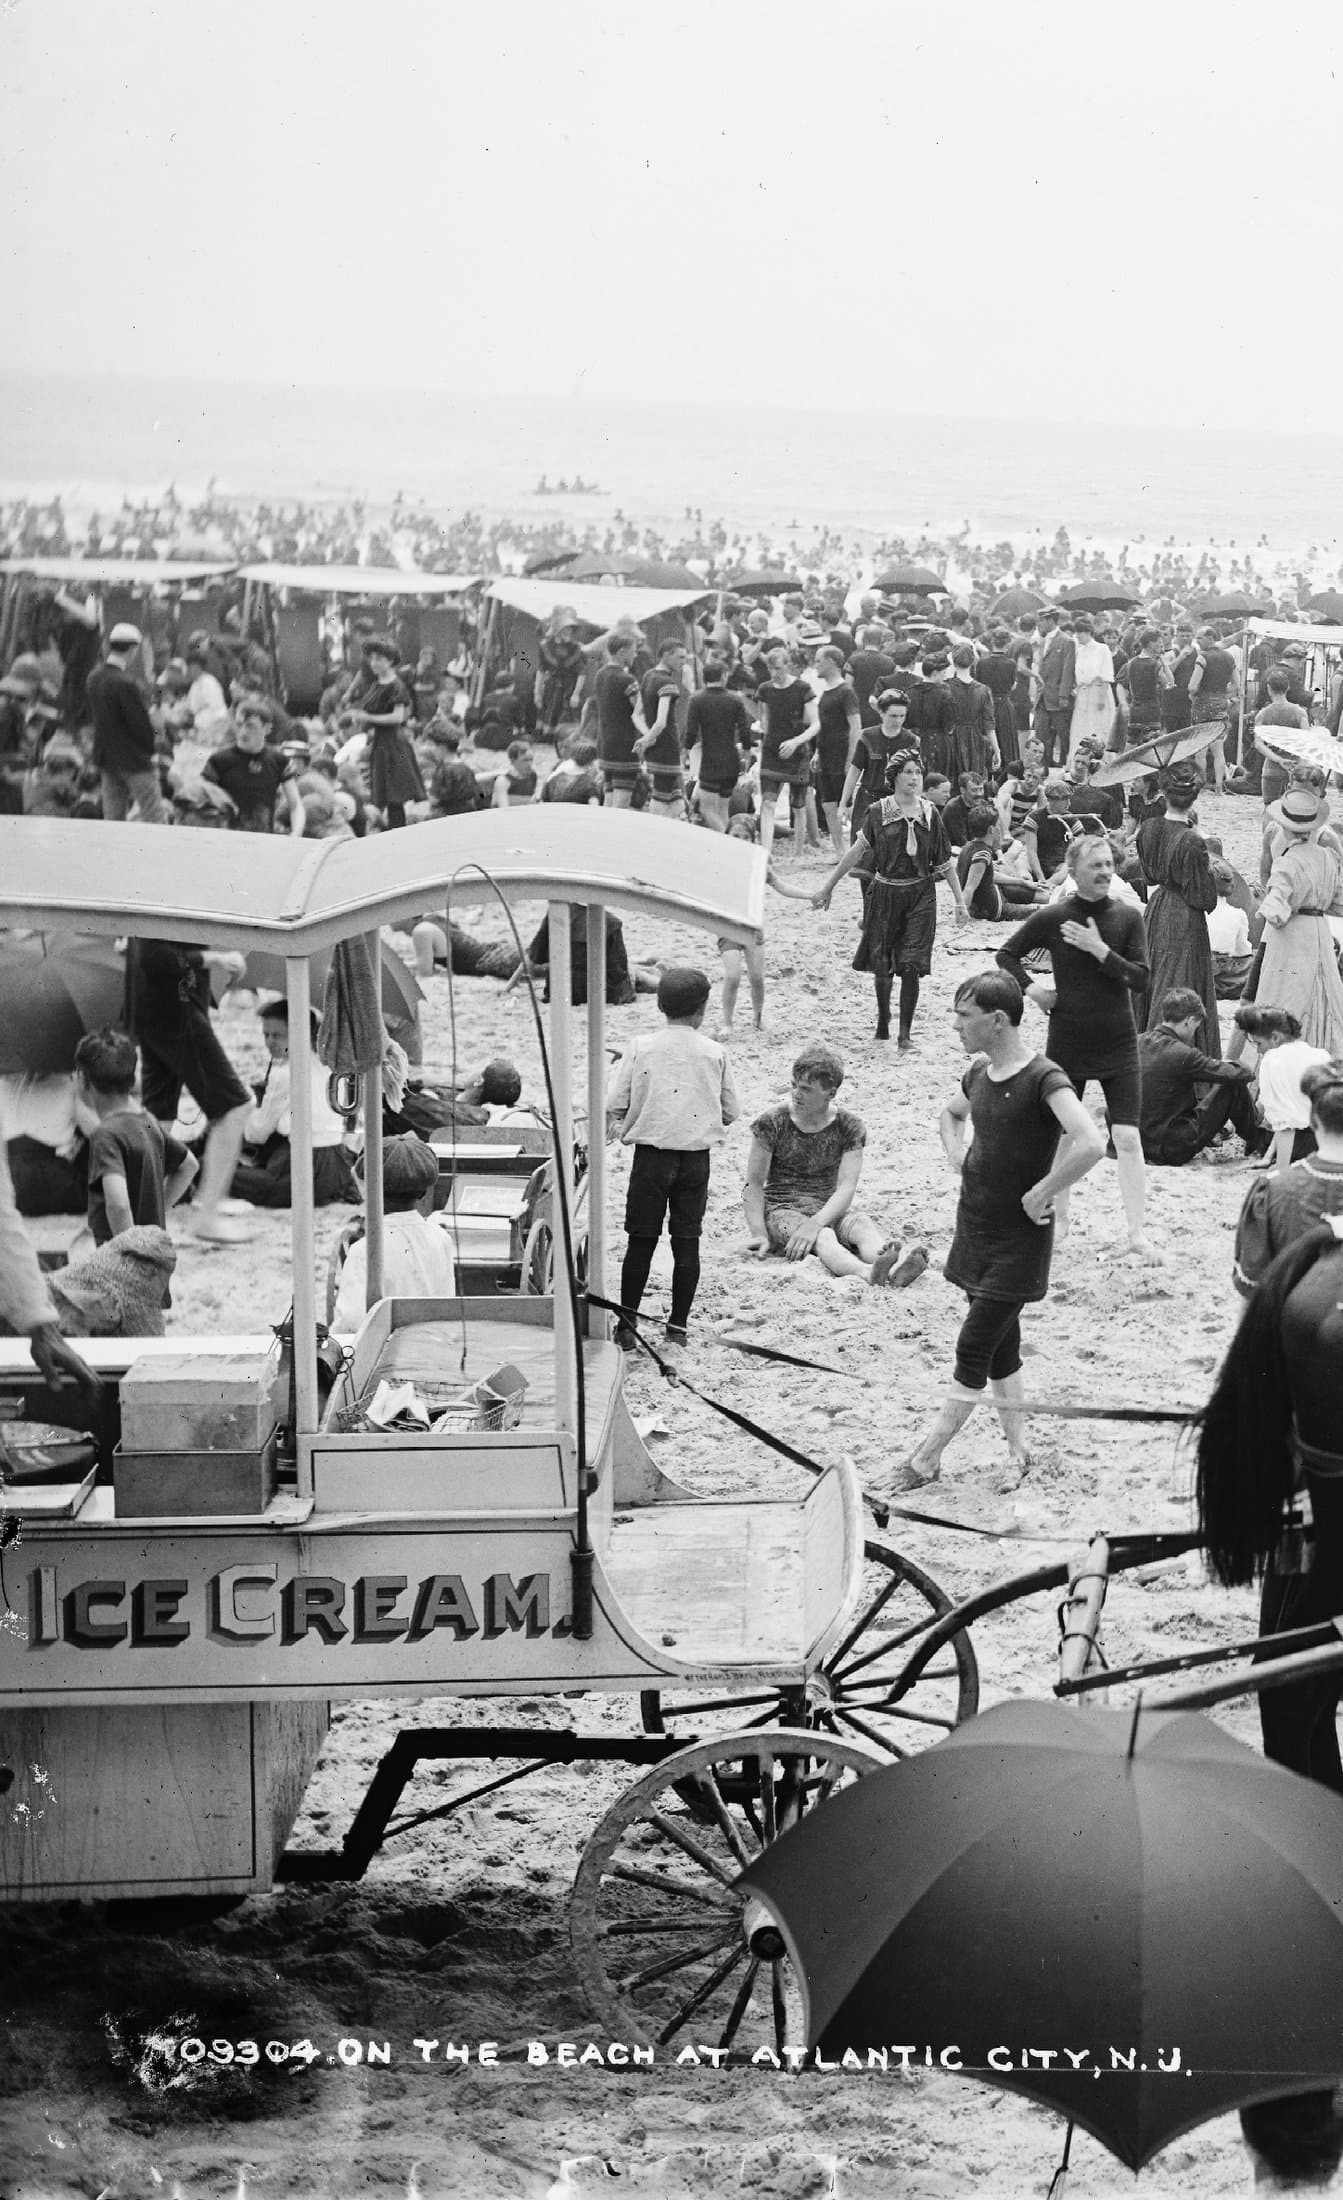 On the beach at Atlantic City (around 1904) (1)